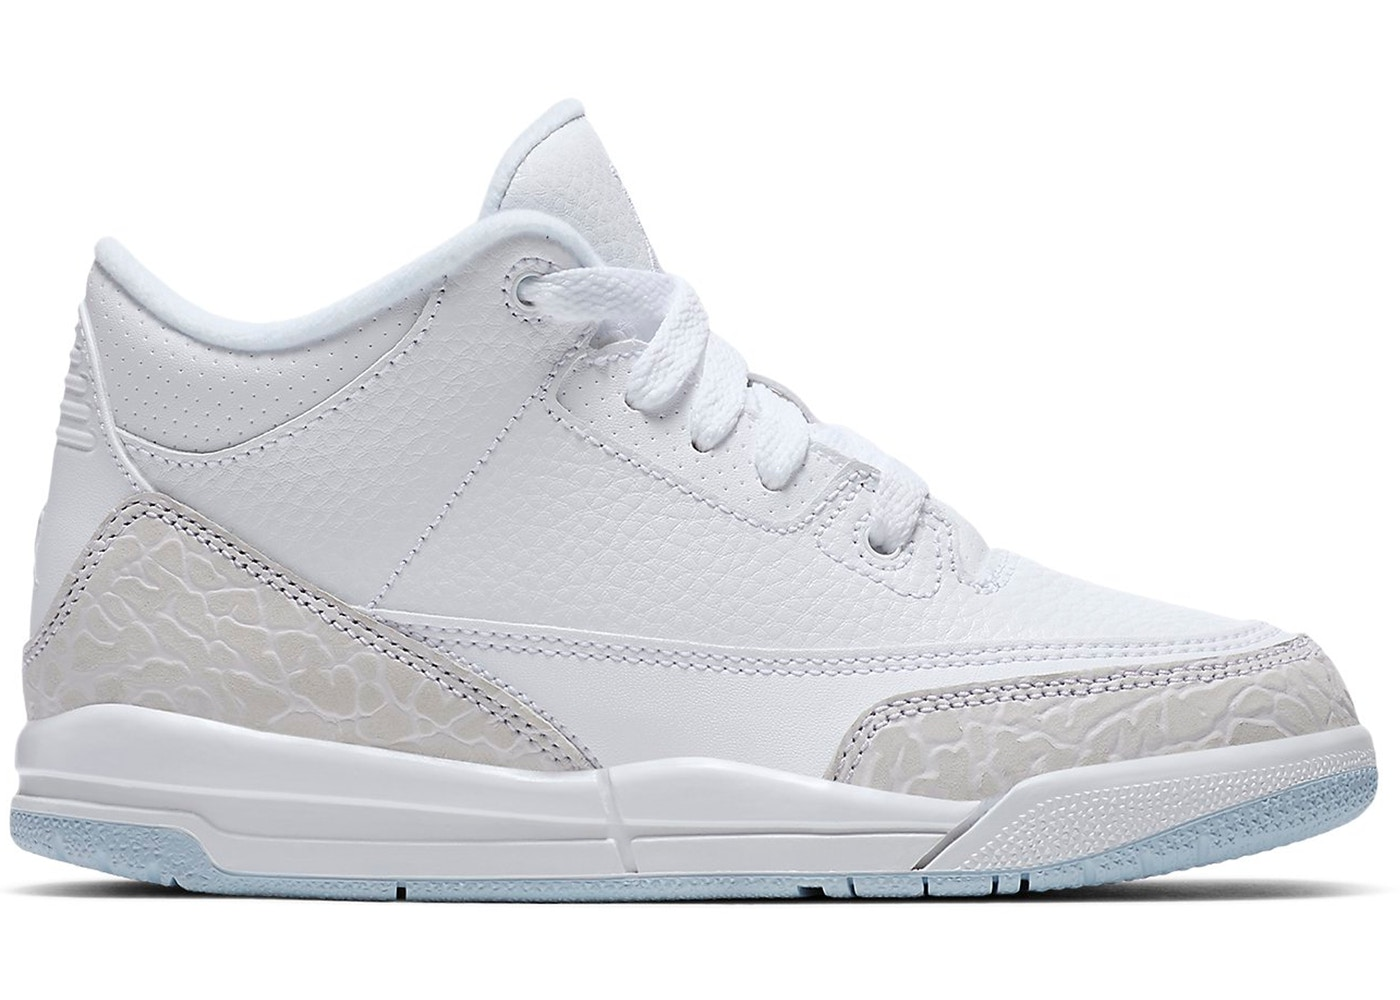 check out 4b0d9 82996 Air Jordan 3 Size 12 Shoes - Release Date